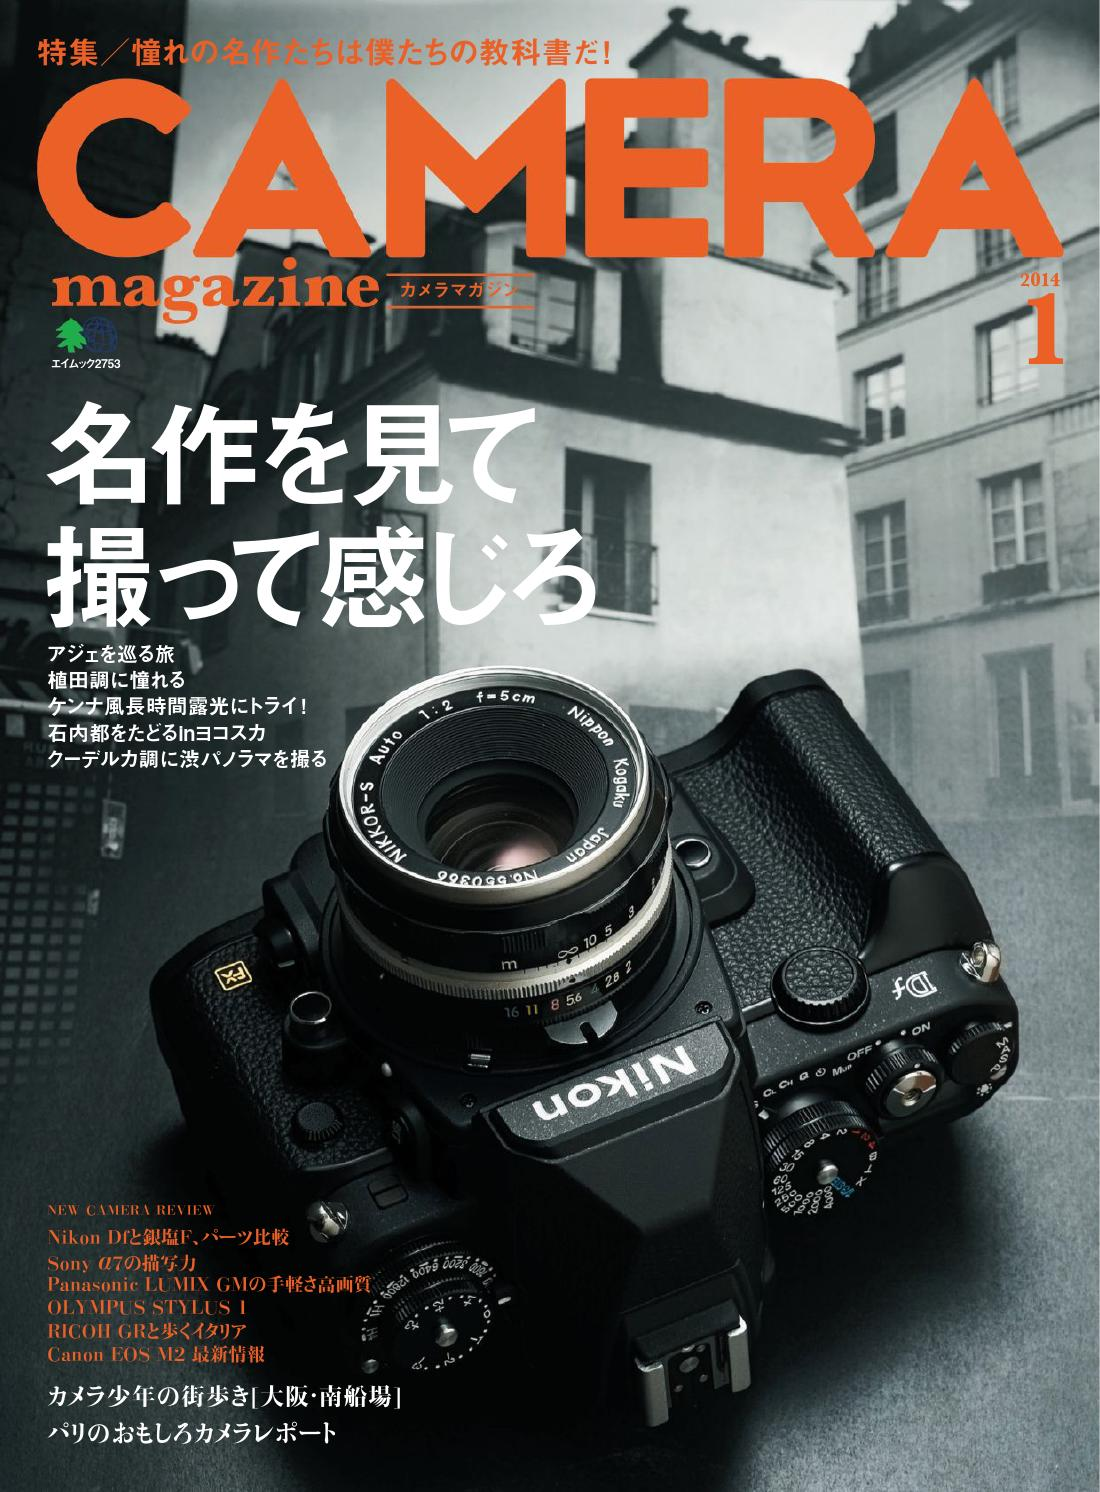 4da8465b8c Camera magazine japan issue no 25 bak by Seo LiVing - issuu